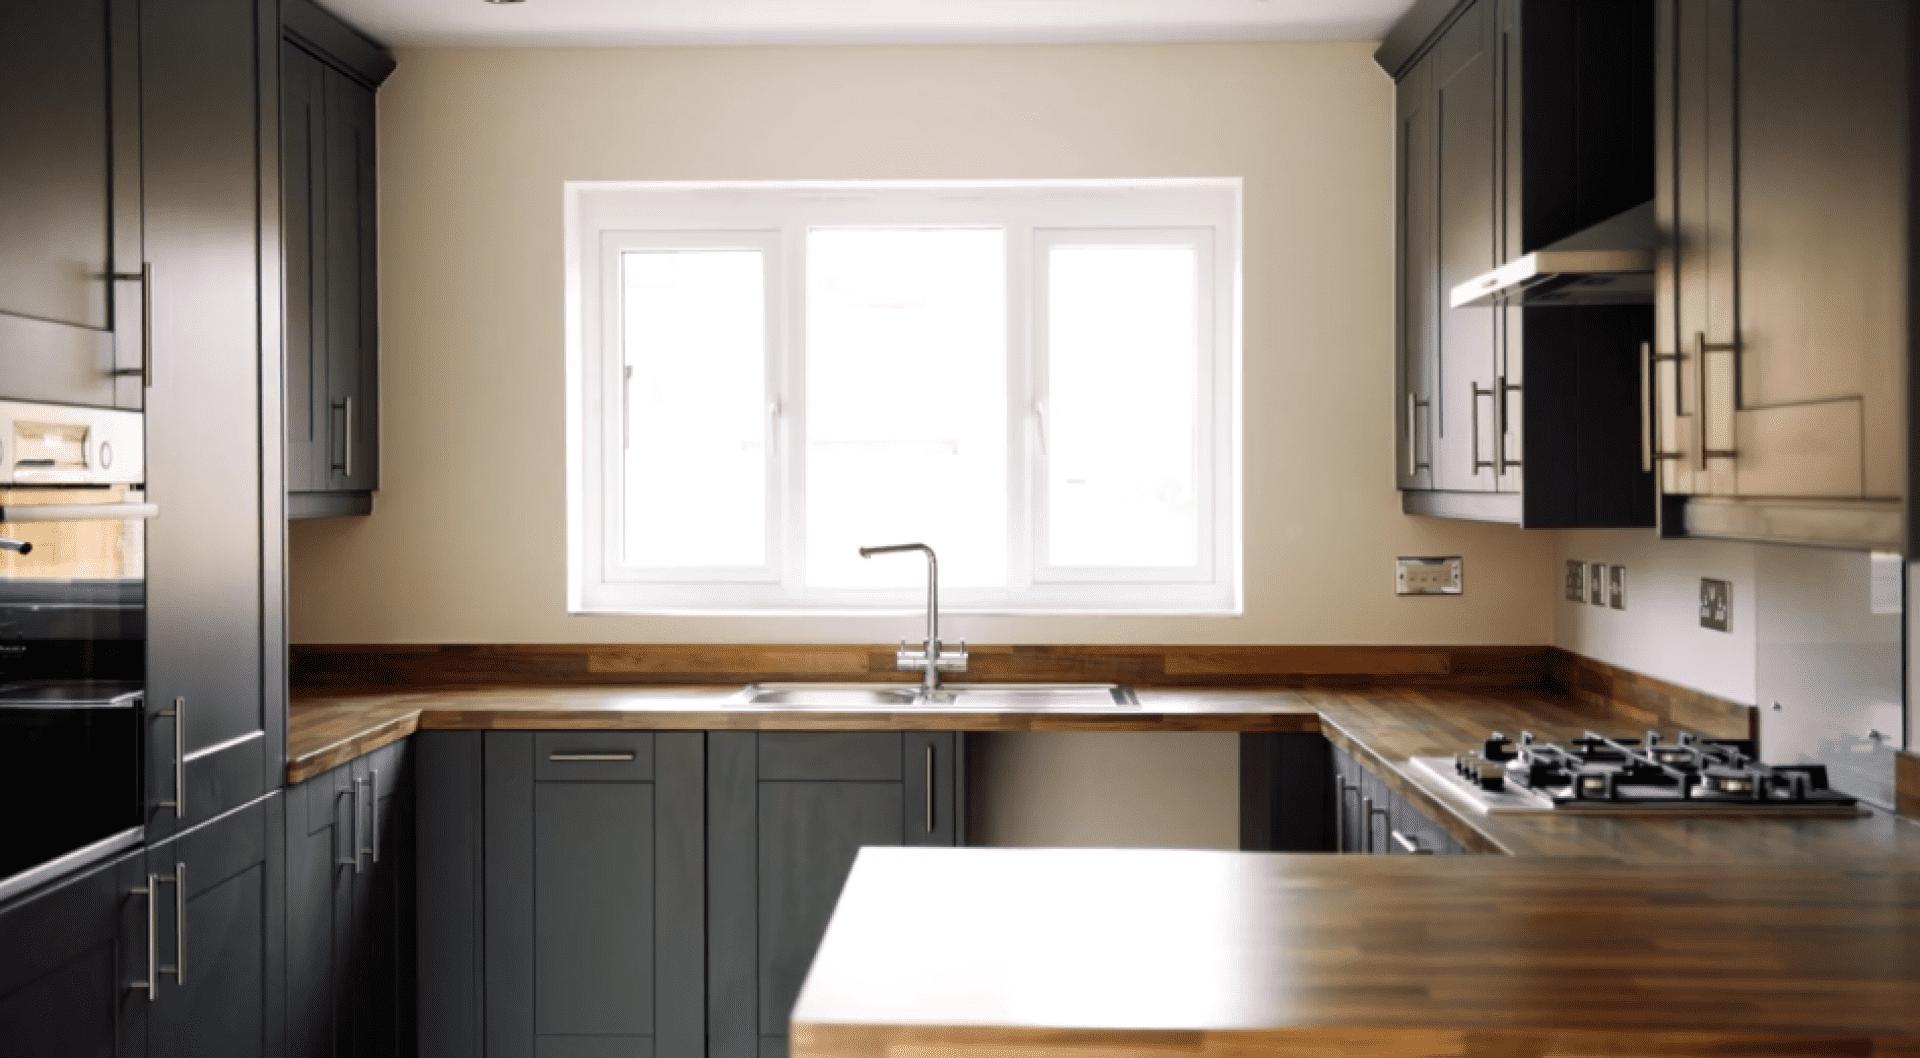 Harewood Estates' kitchen